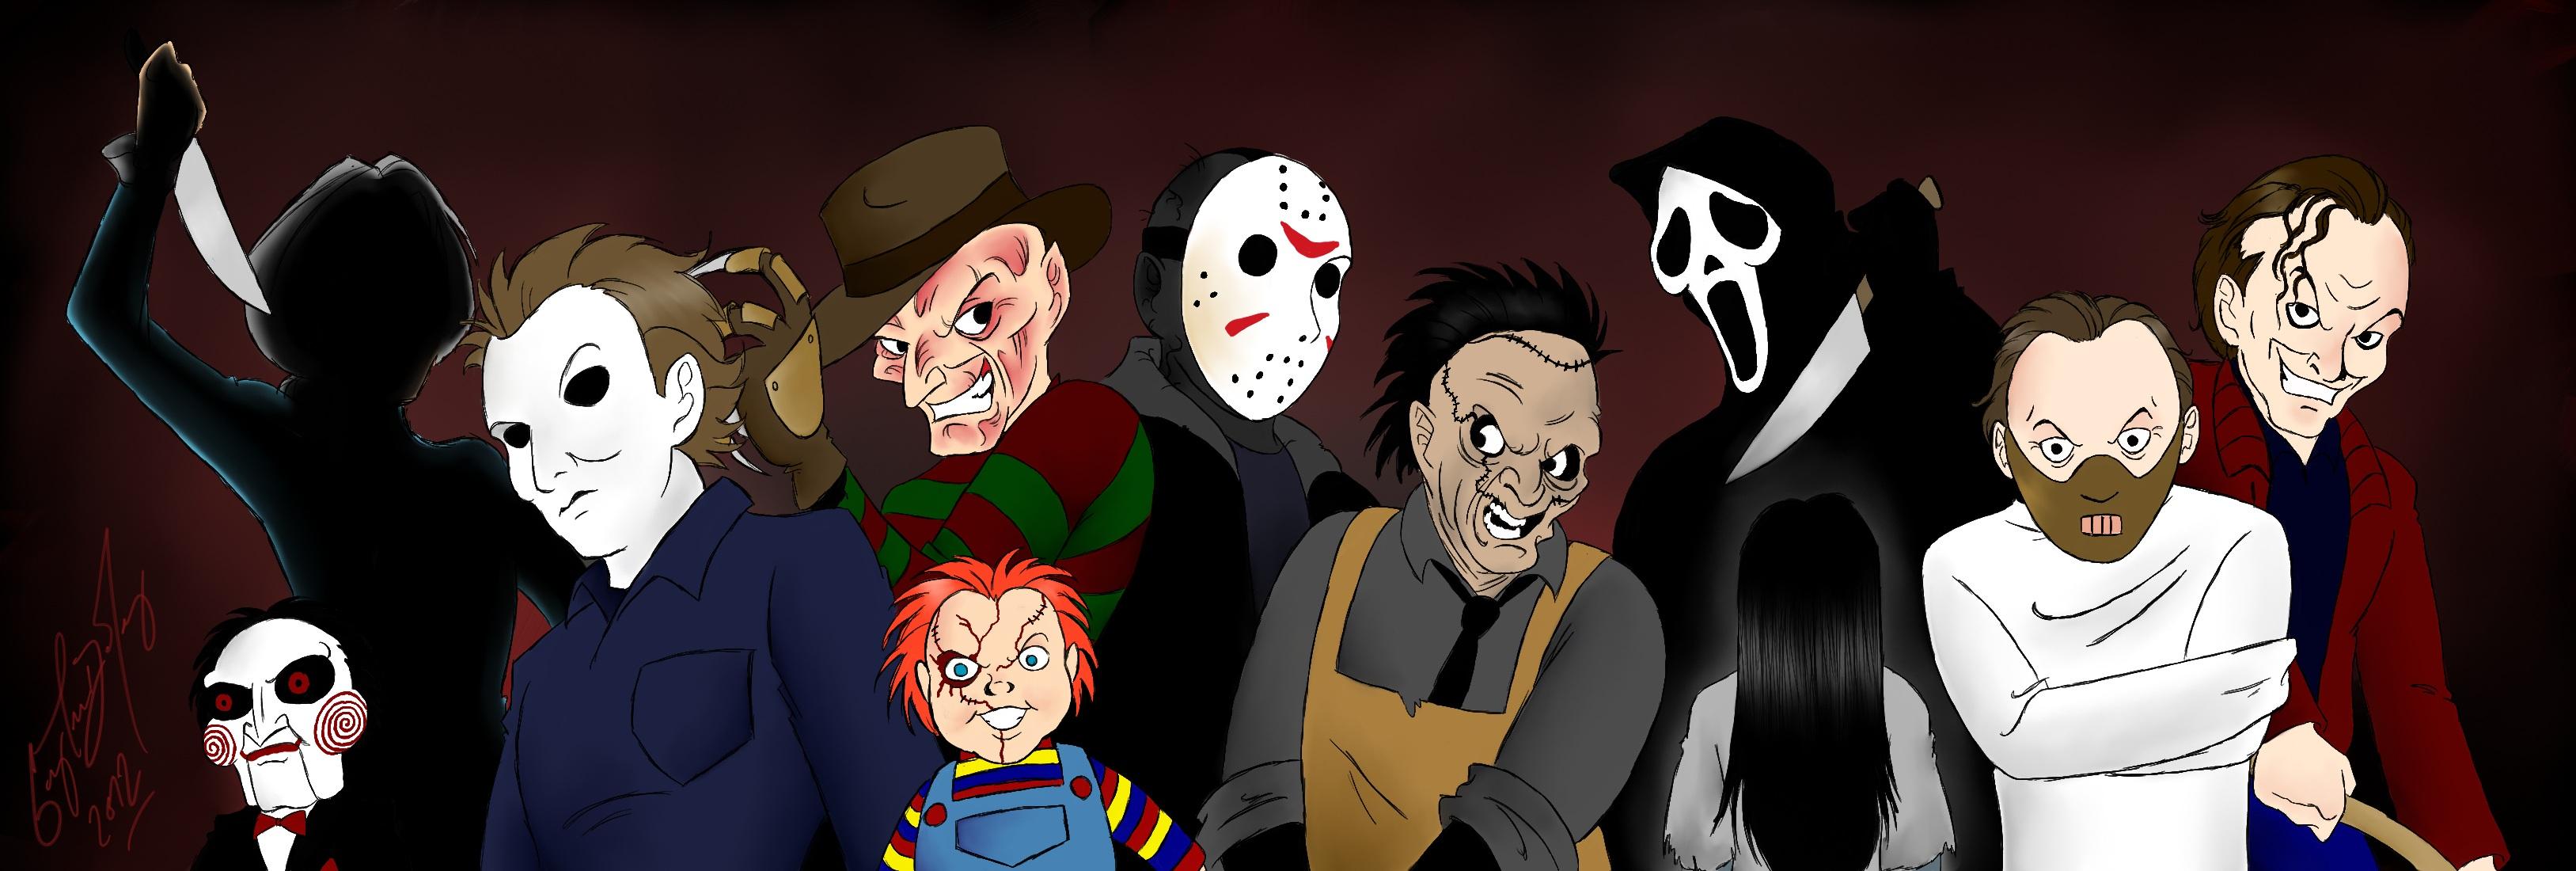 horror movie icons by darthguyford fan art digital art drawings movies 3255x1100